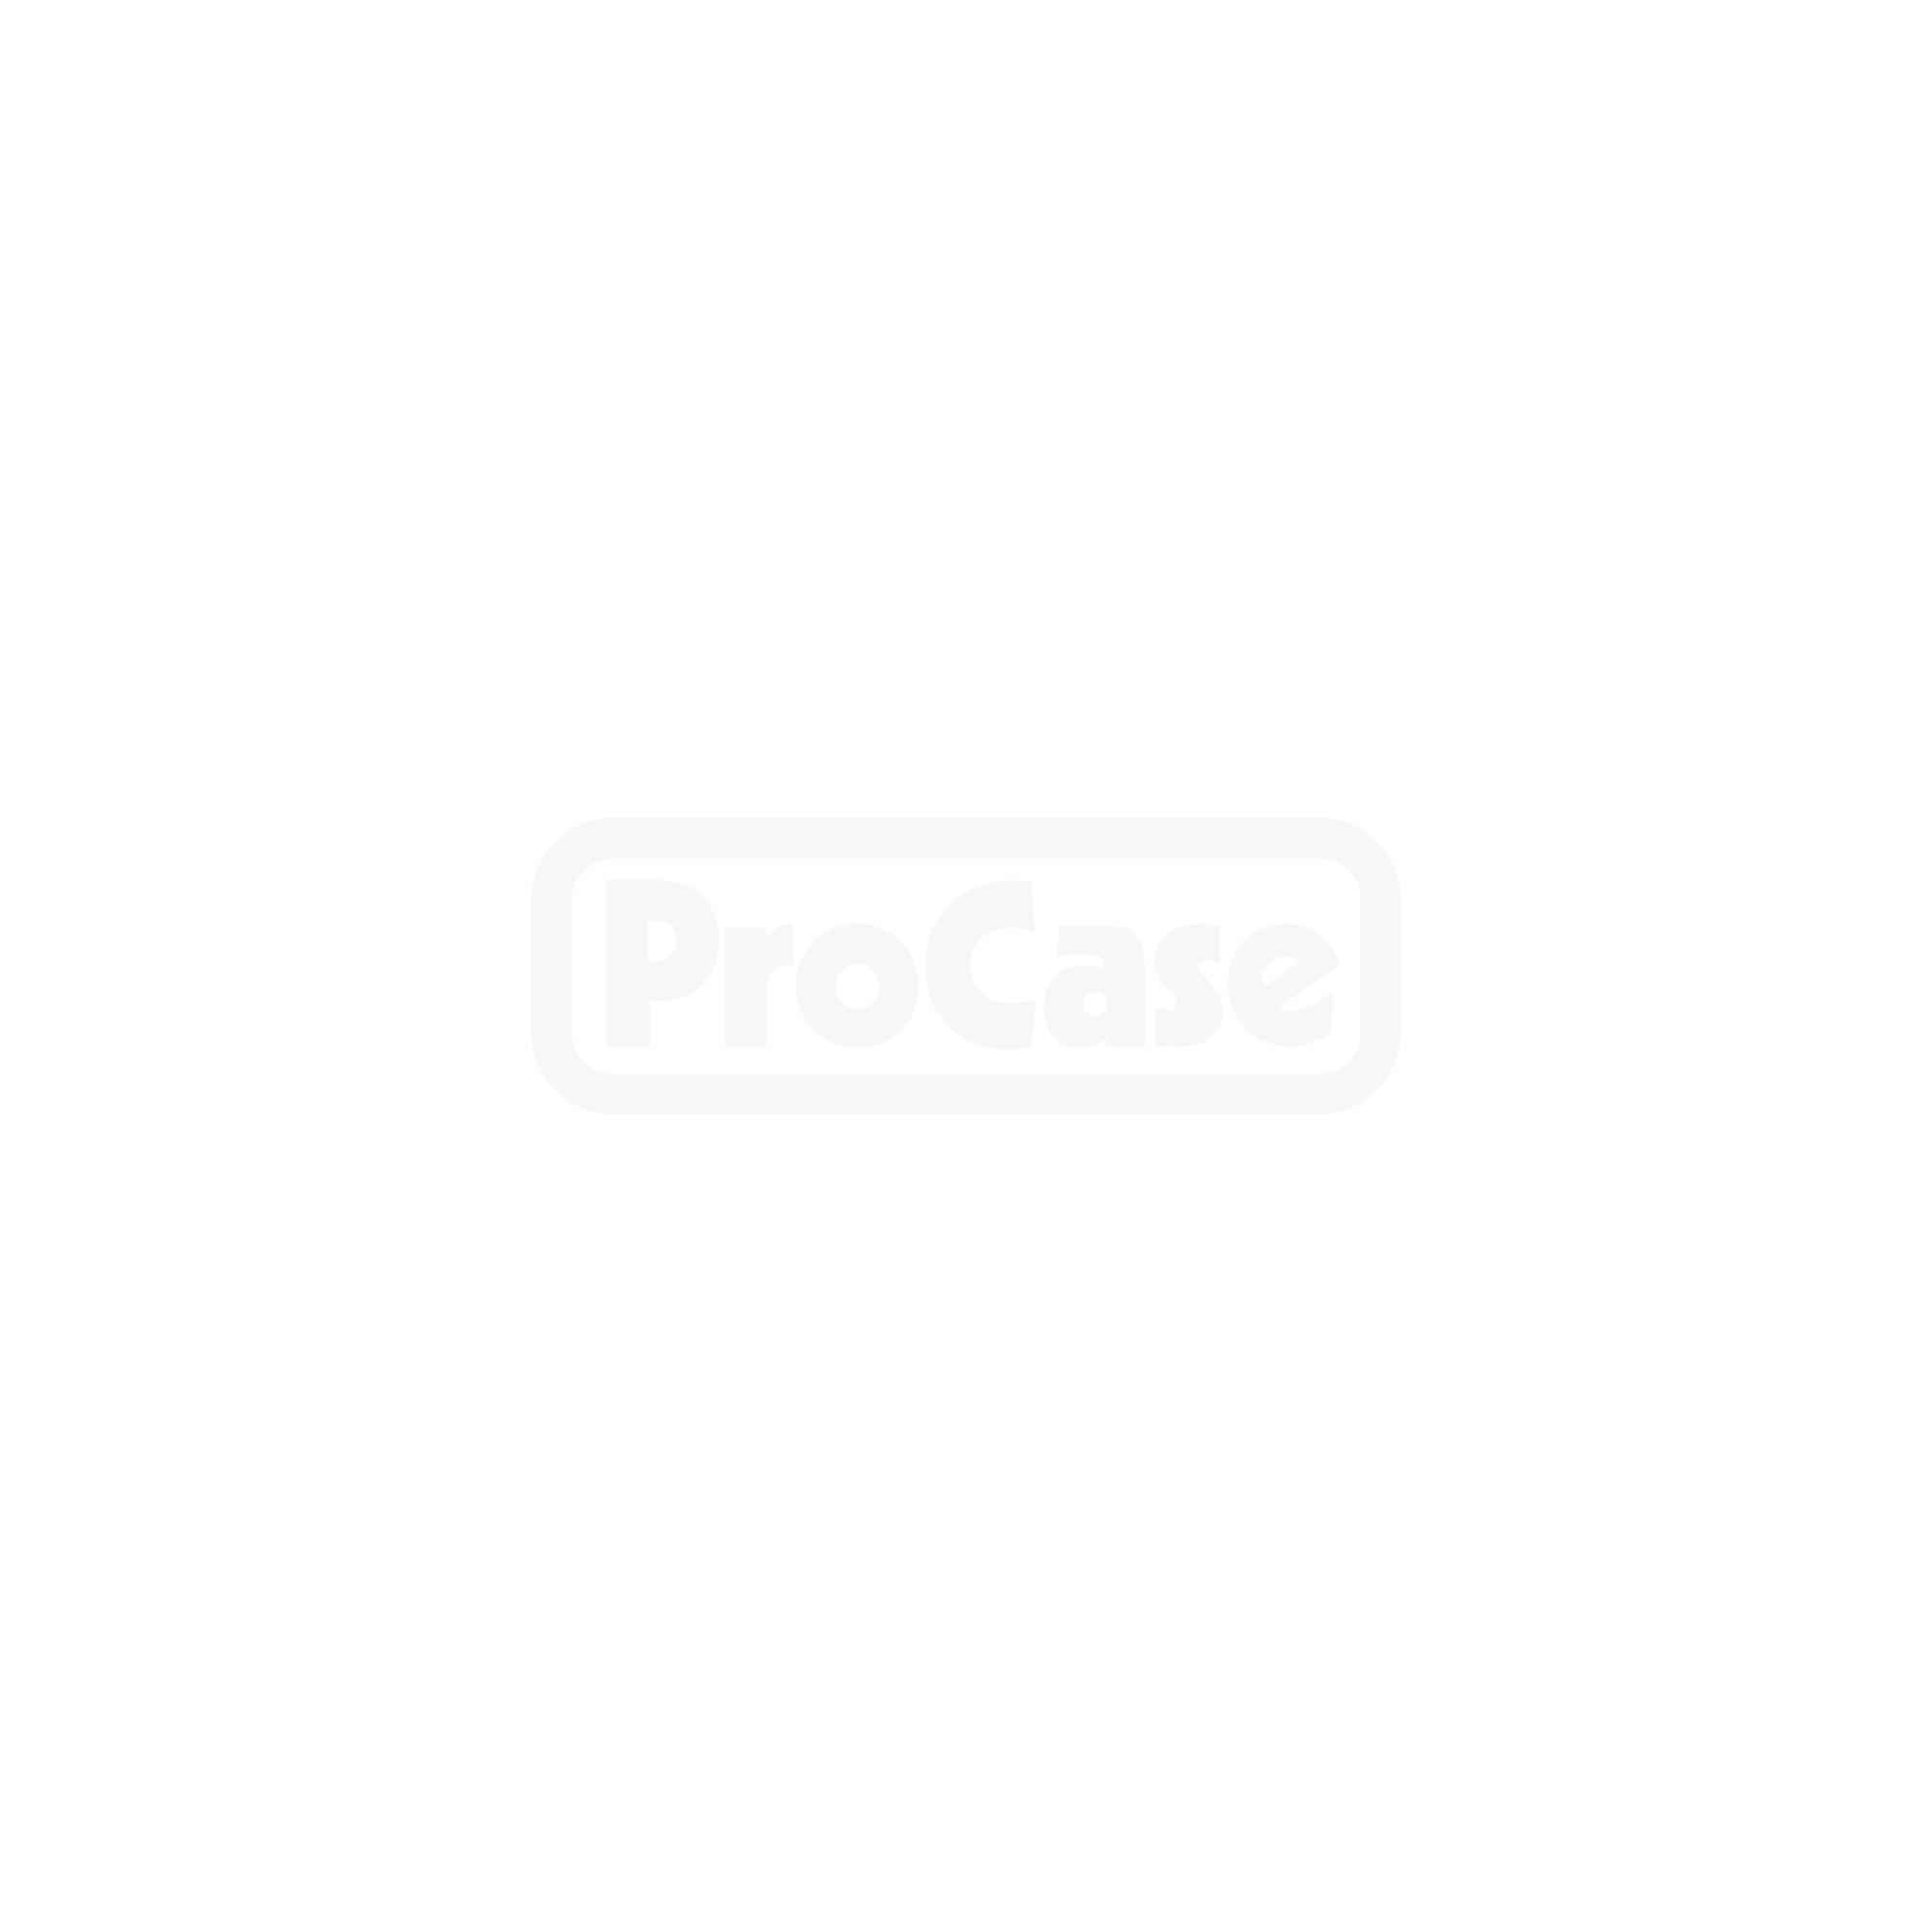 Flightcase für Sick Analysesystem MCS100E 2